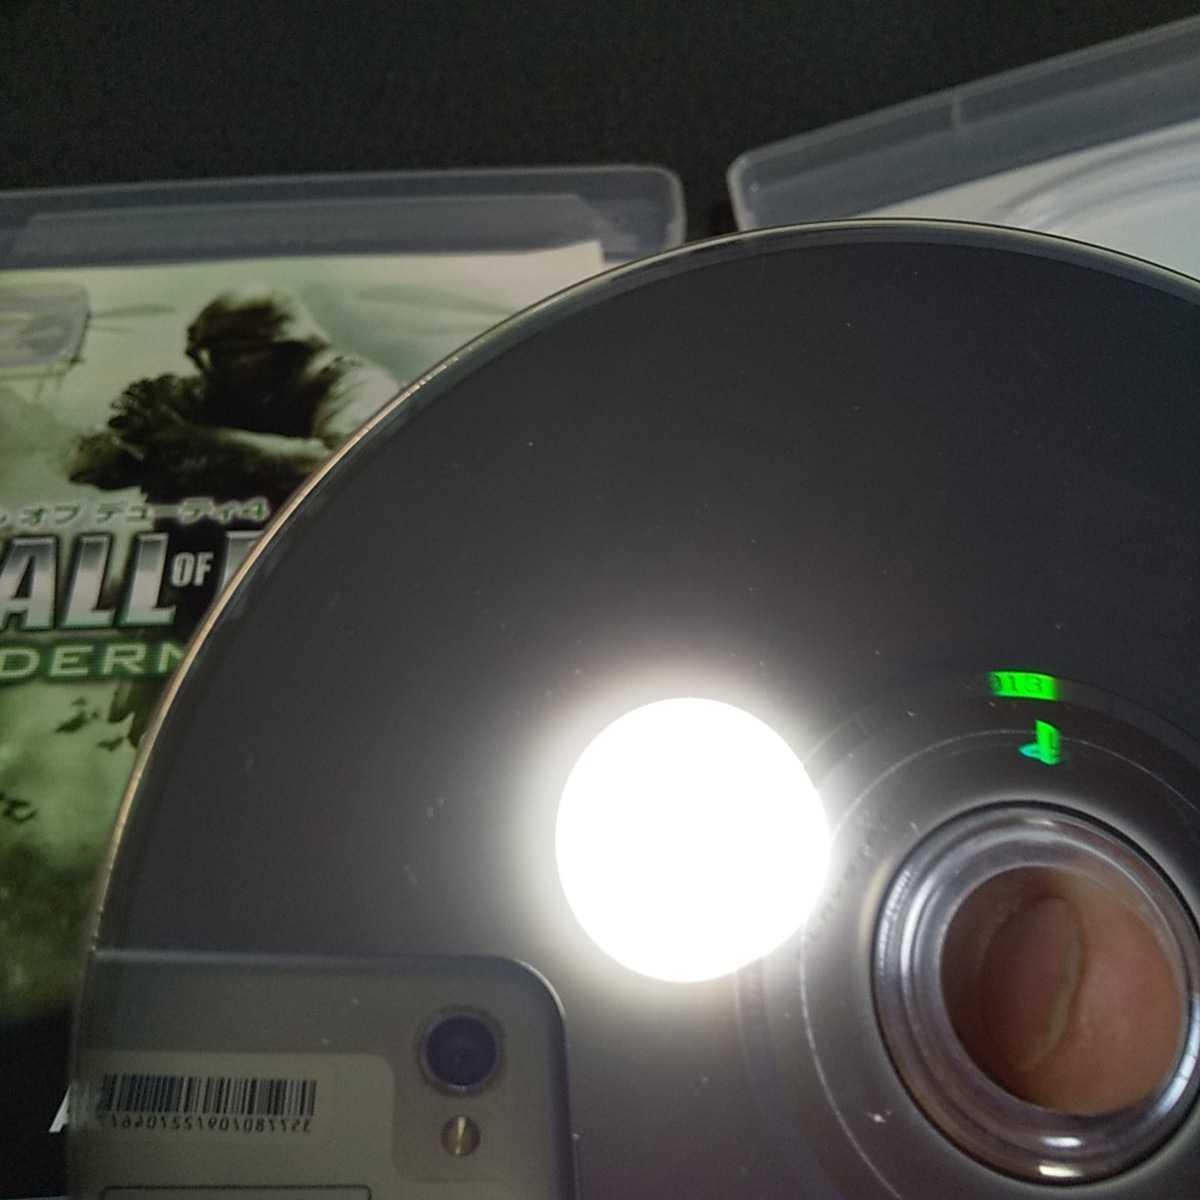 PS3【コールオブデューティ4/モダン・ウォーフェア】2007年アクティビジョン ※暴力グロテスクシーン ※対象年齢15歳以上 返金保証あり